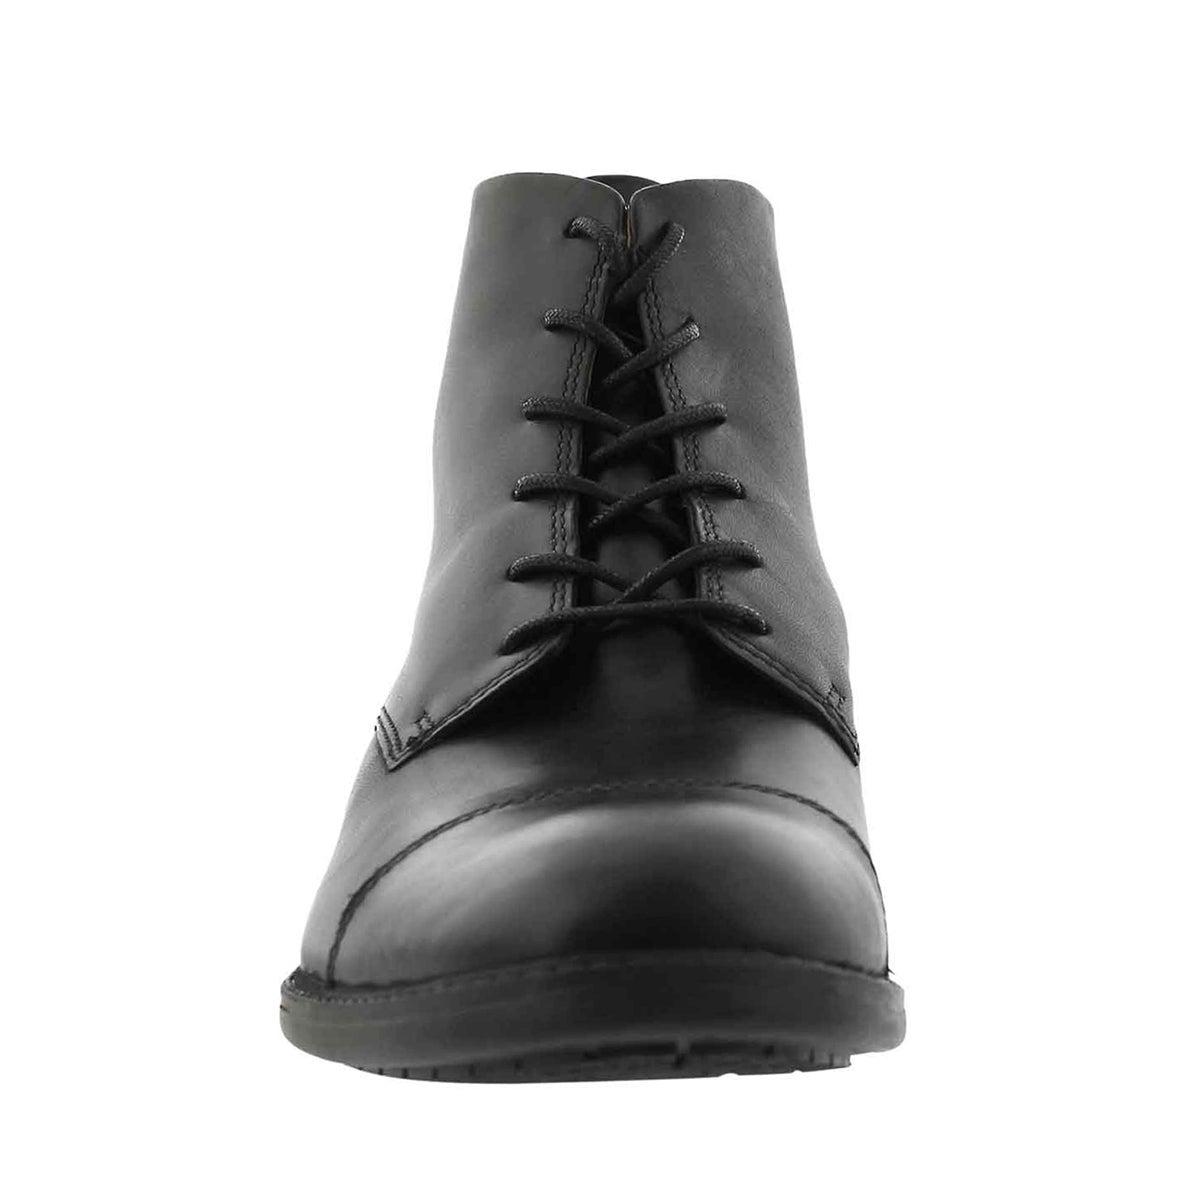 Mns Truxton High blk lace up dress boot